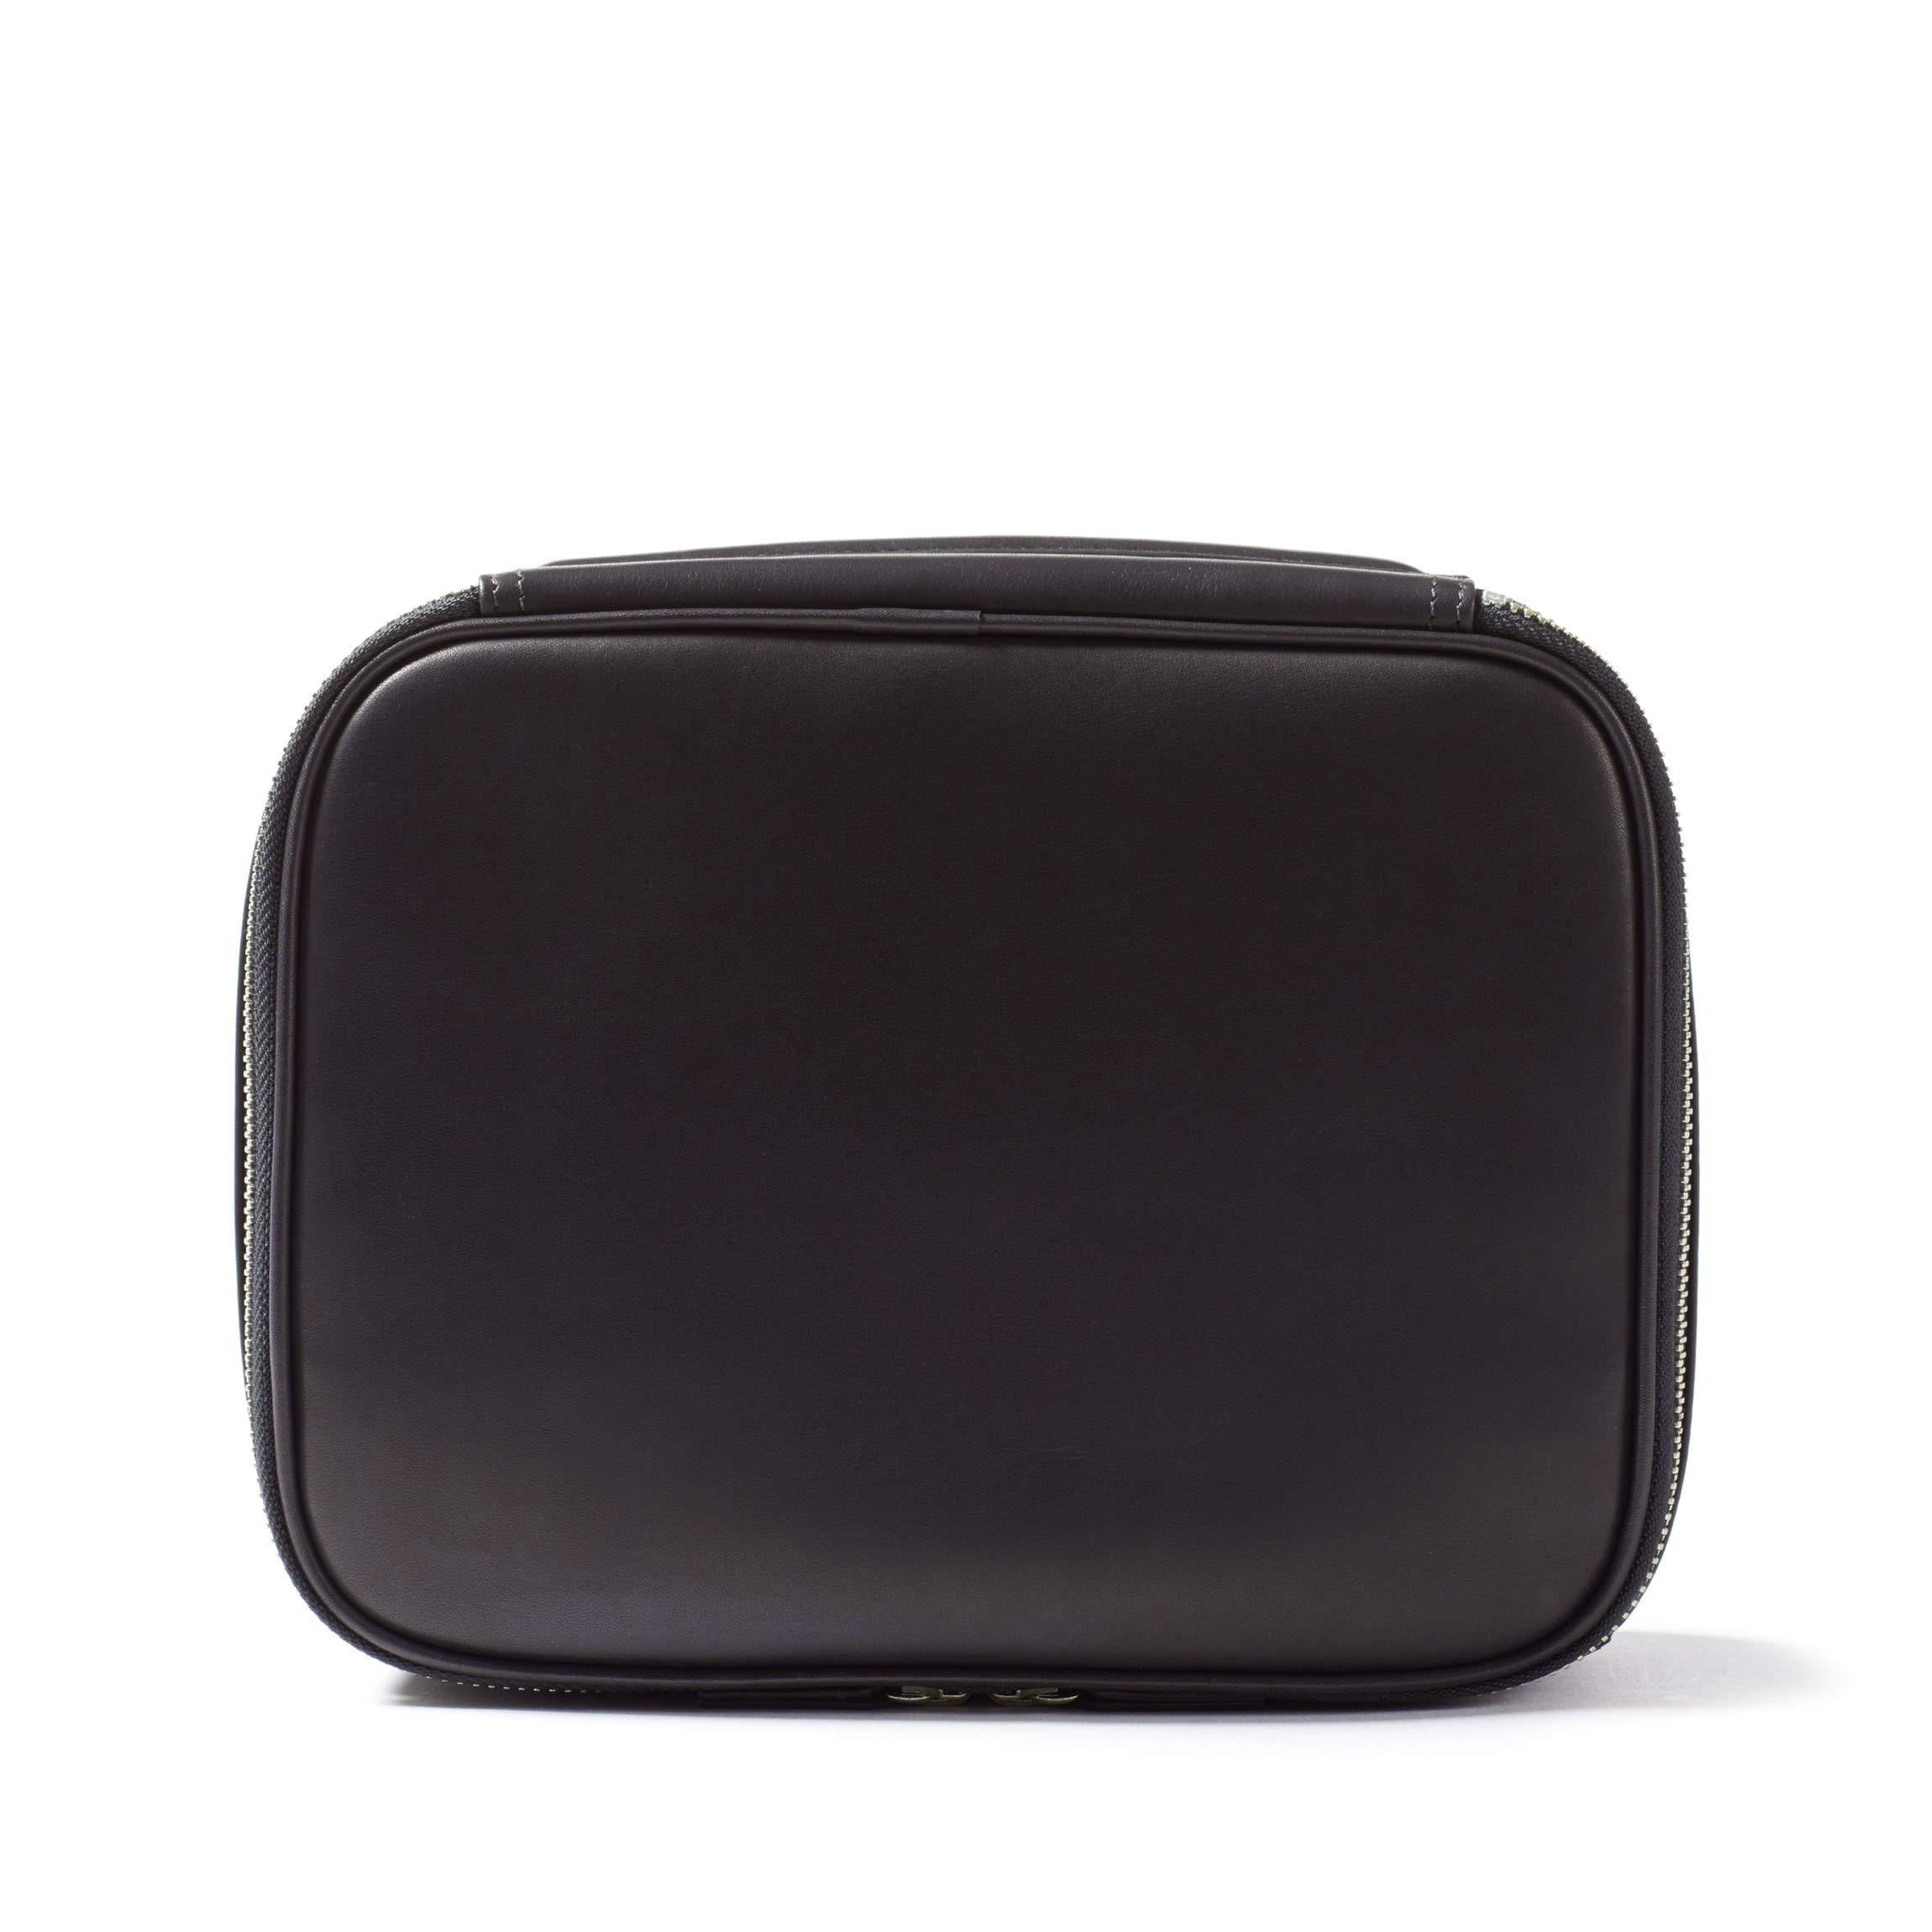 Leatherology Large Travel Organizer - Full Grain German Leather Leather - Black Oil (black)